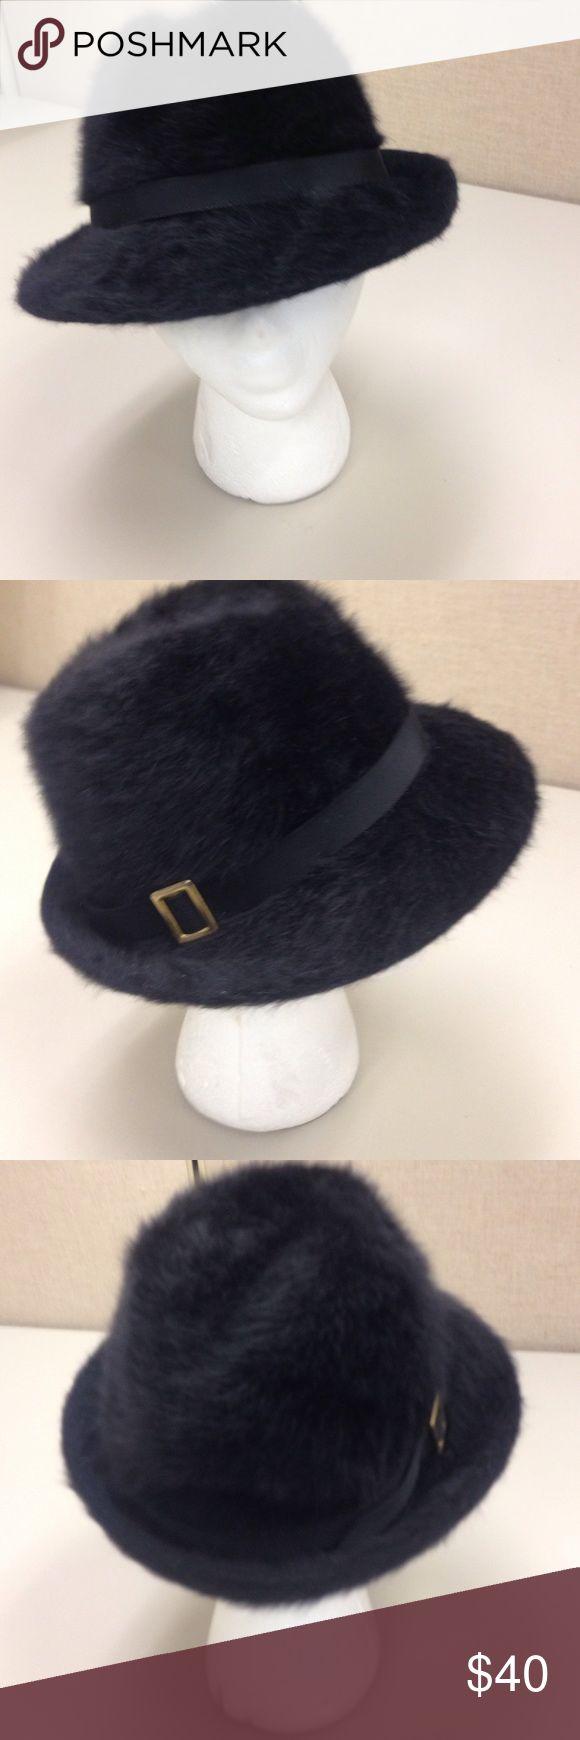 RACHEL KANGOL ANGORA FEDORA HAT Rachel styled fedora. Clean & sharp. Fits. S-M. Long matching angora scarf 66L x 6W Kangol Accessories Hats